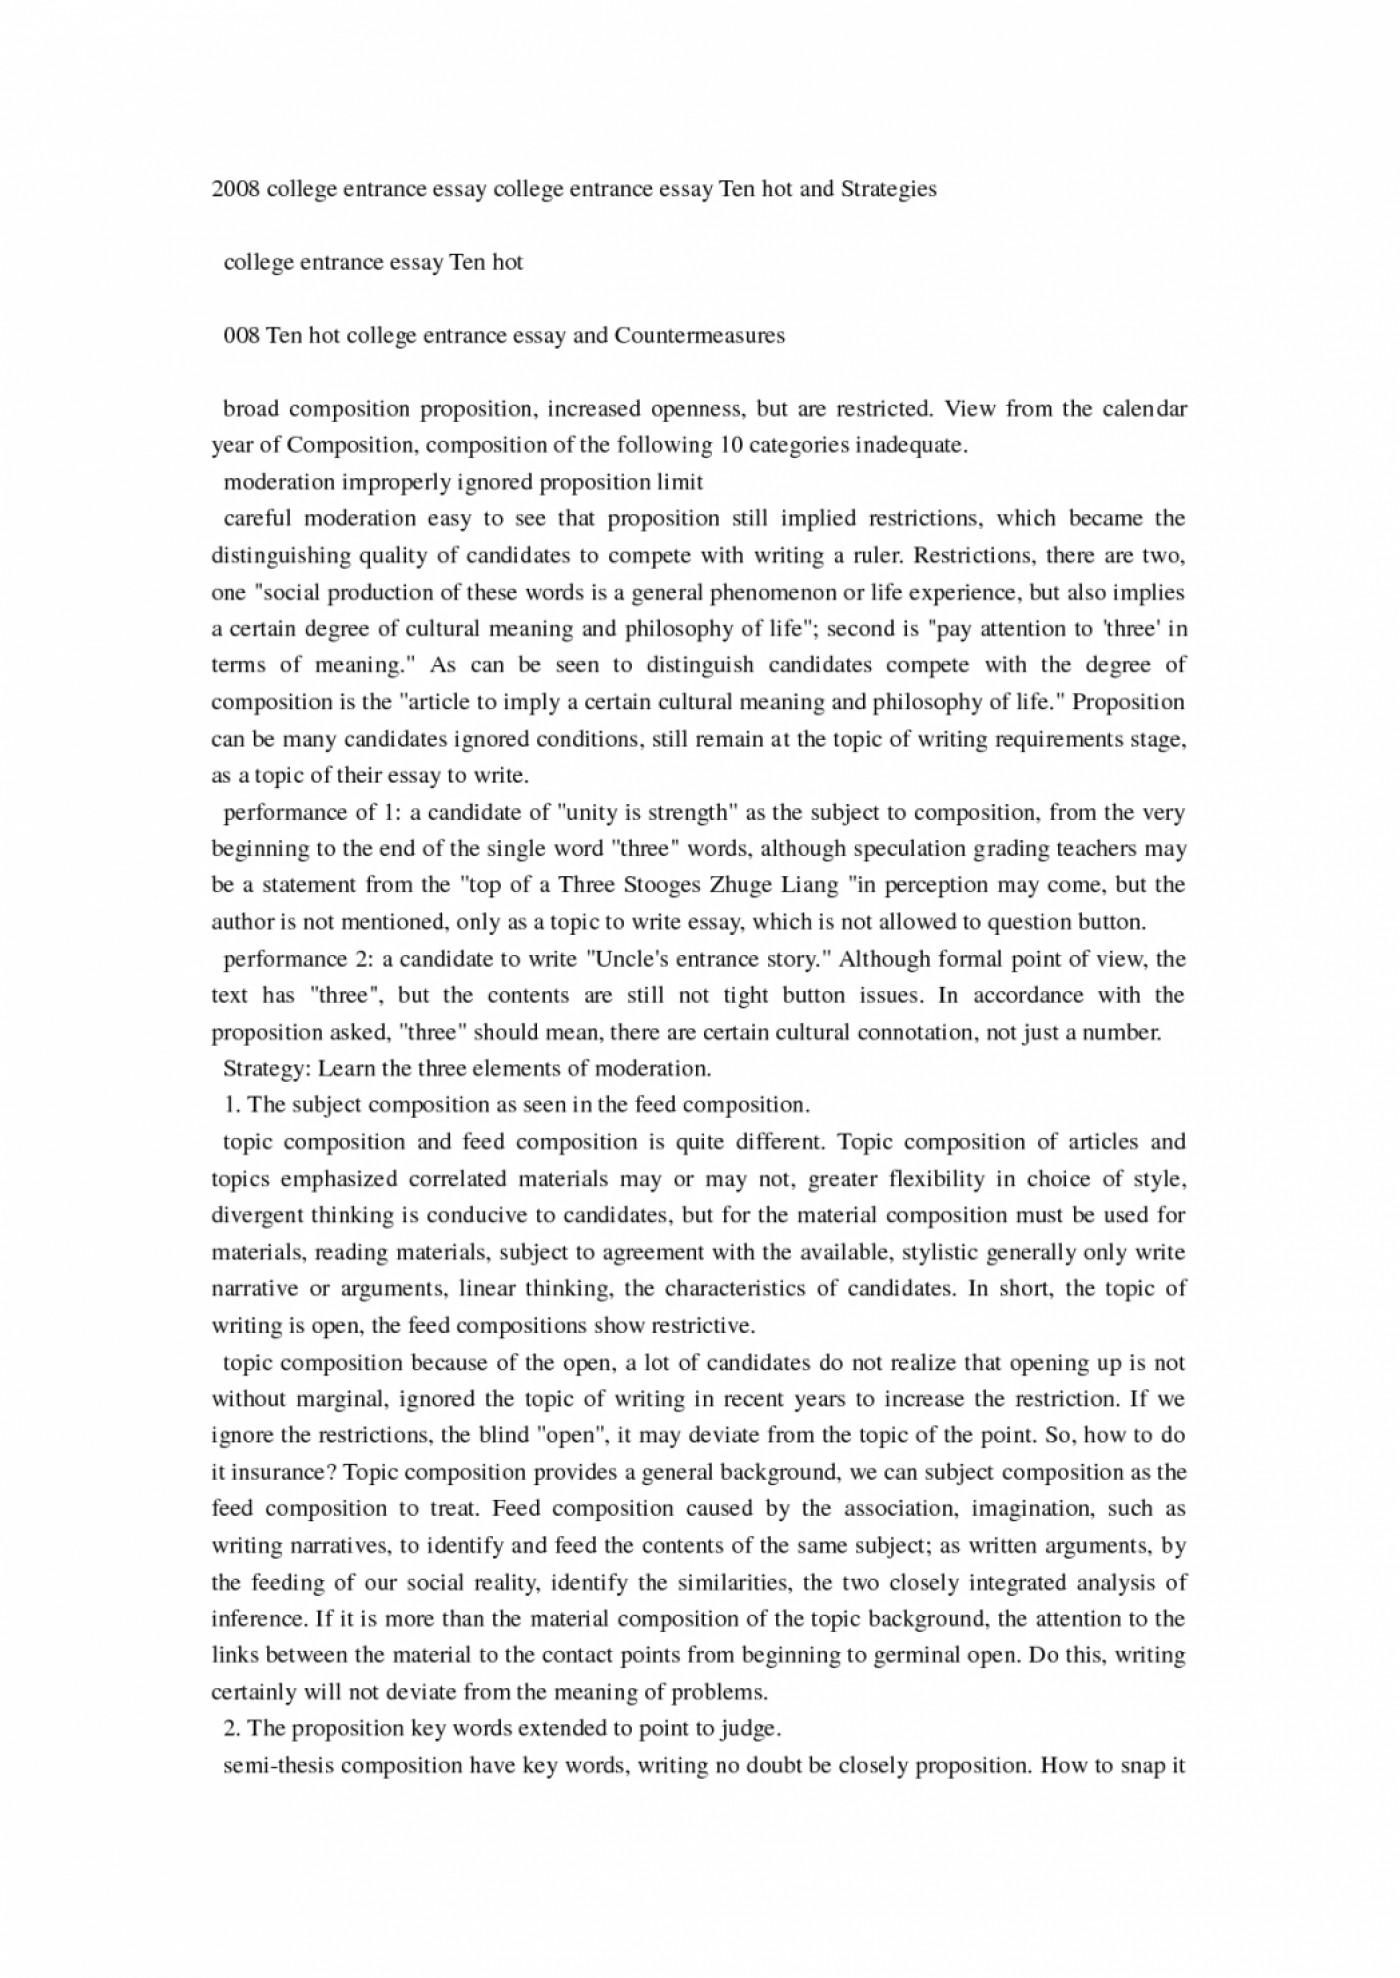 Wiseman peacock hypothesis